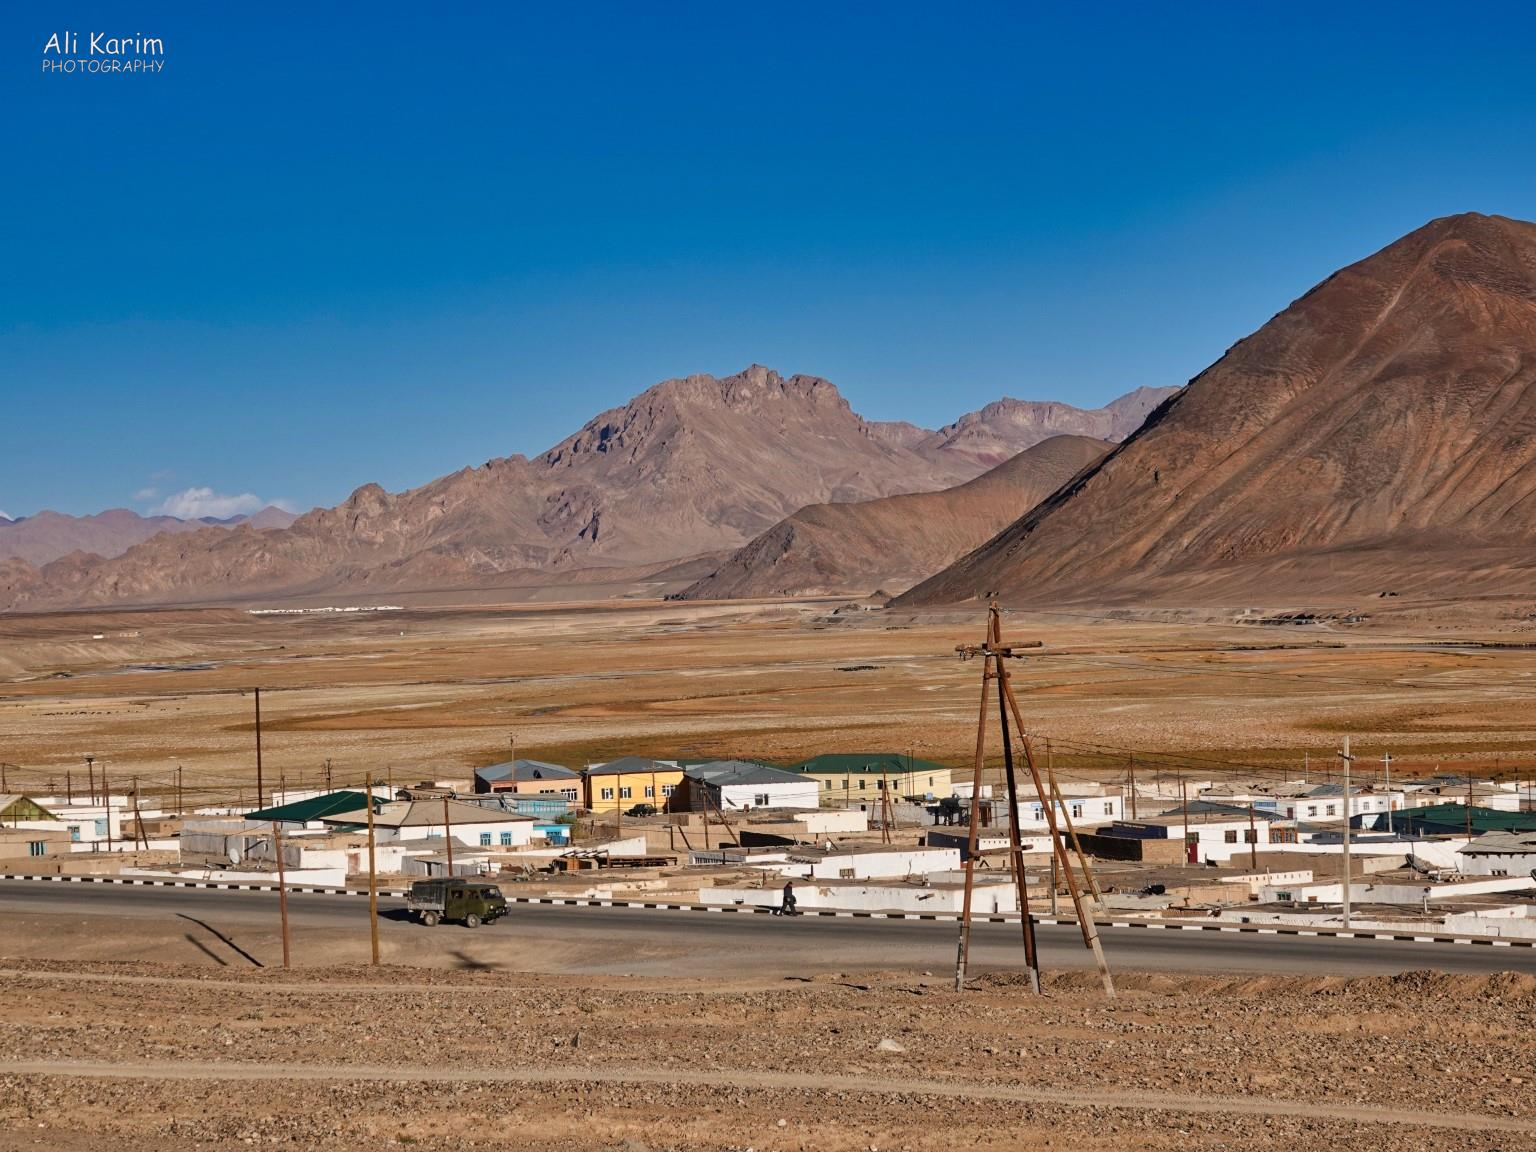 More Murghab & Alichur, Tajikistan, Dusty town of Murghab on a flat plain in the Pamir mountains